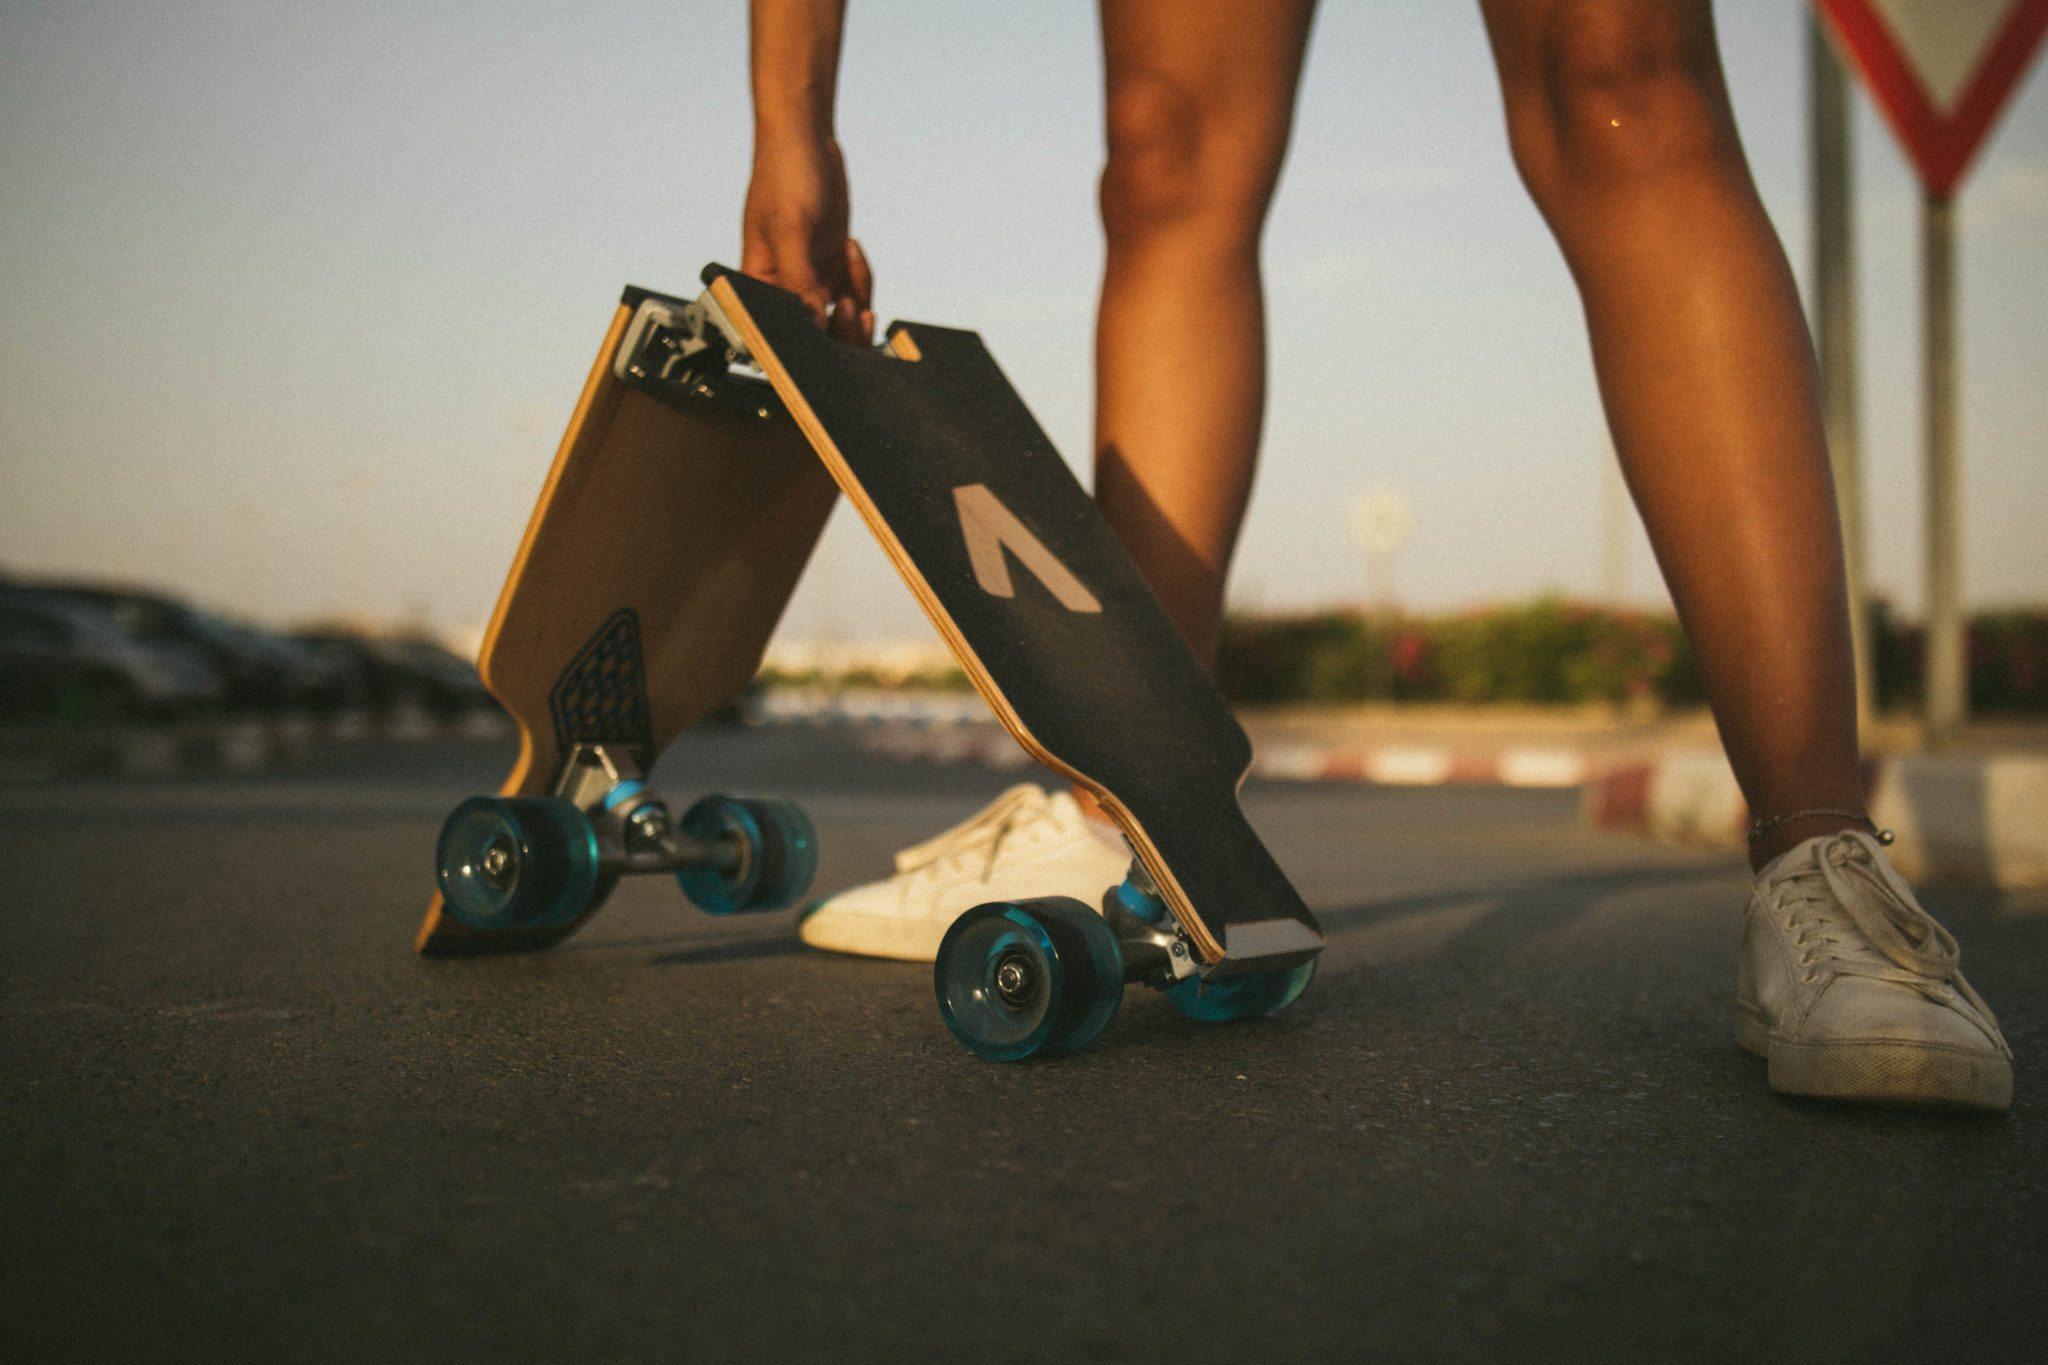 boardup-folding-skate-beach-flare-girl-justdalal-5-8